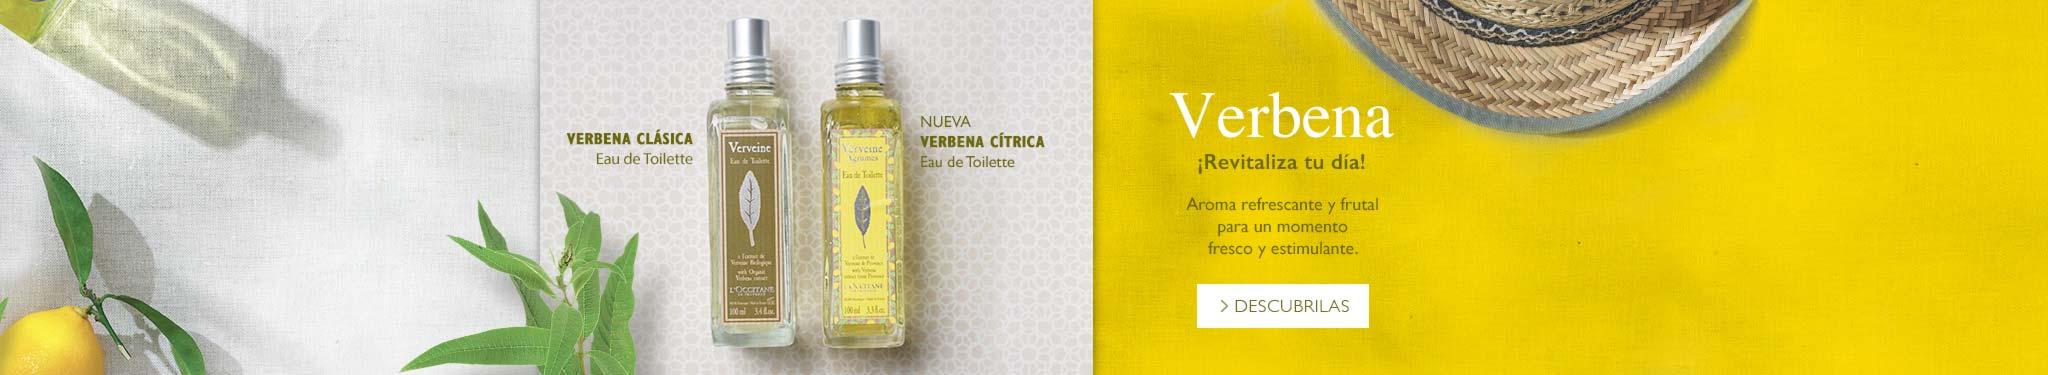 Perfume verbena L'OCCITANE